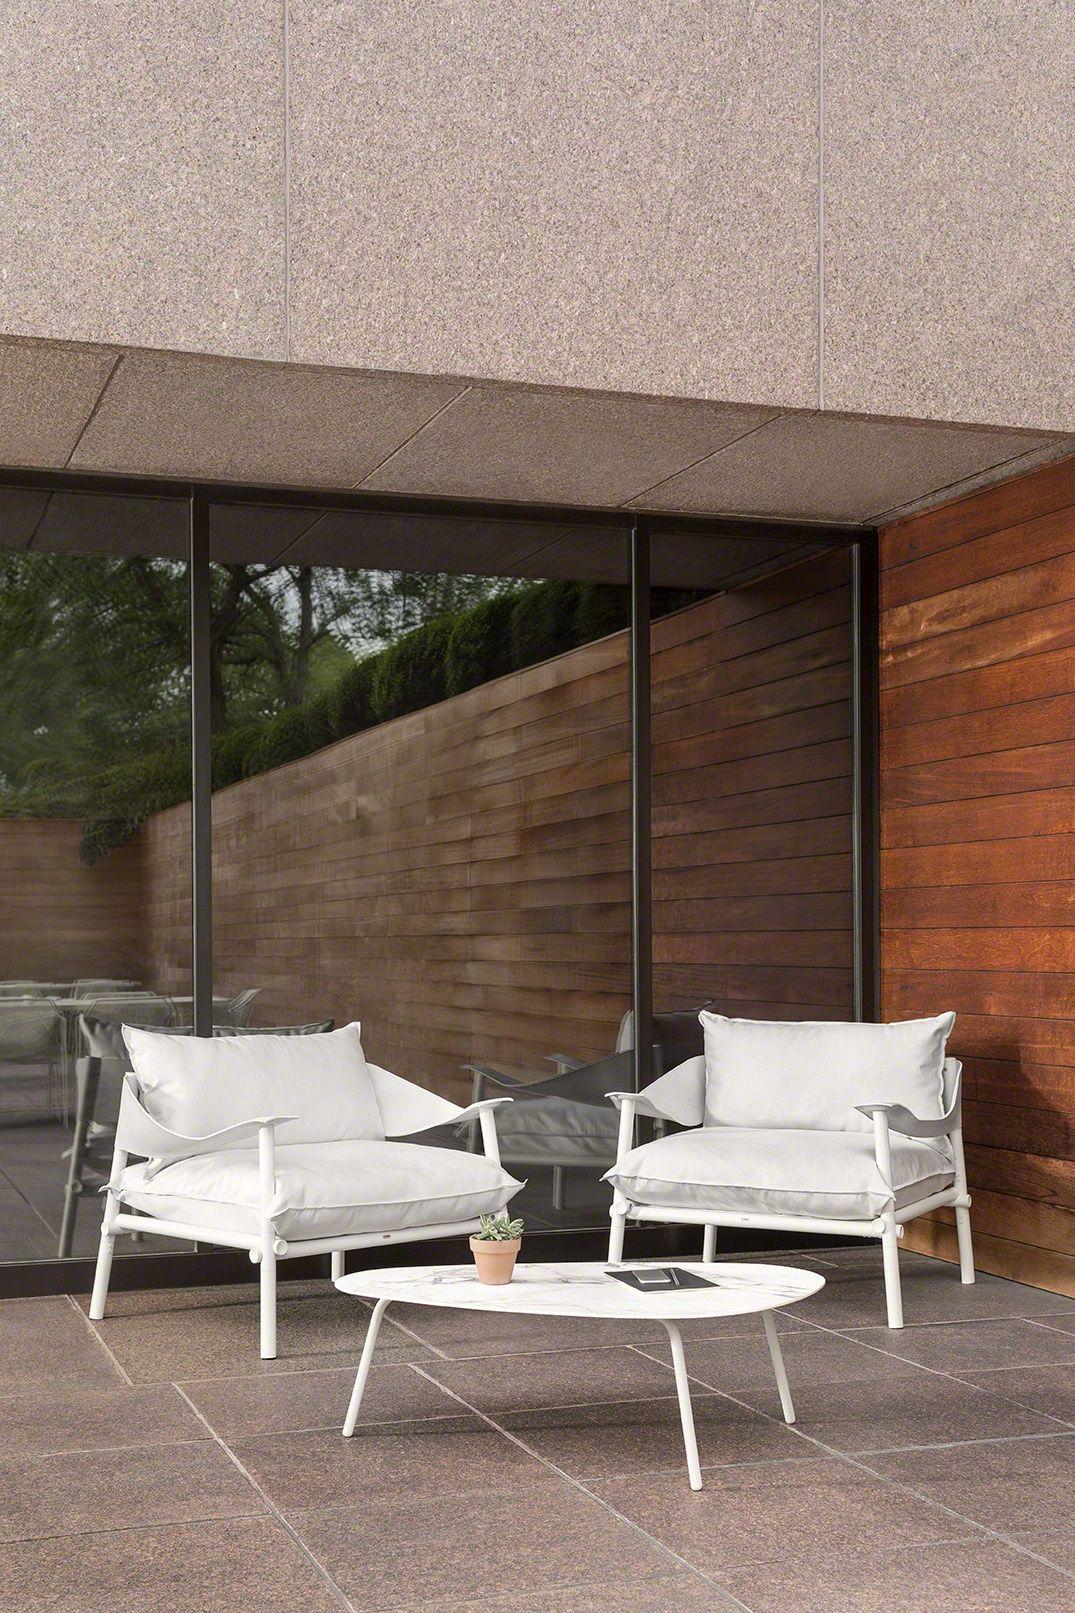 Emu Designer Outdoor furniture by Coalesse   home   Pinterest ...